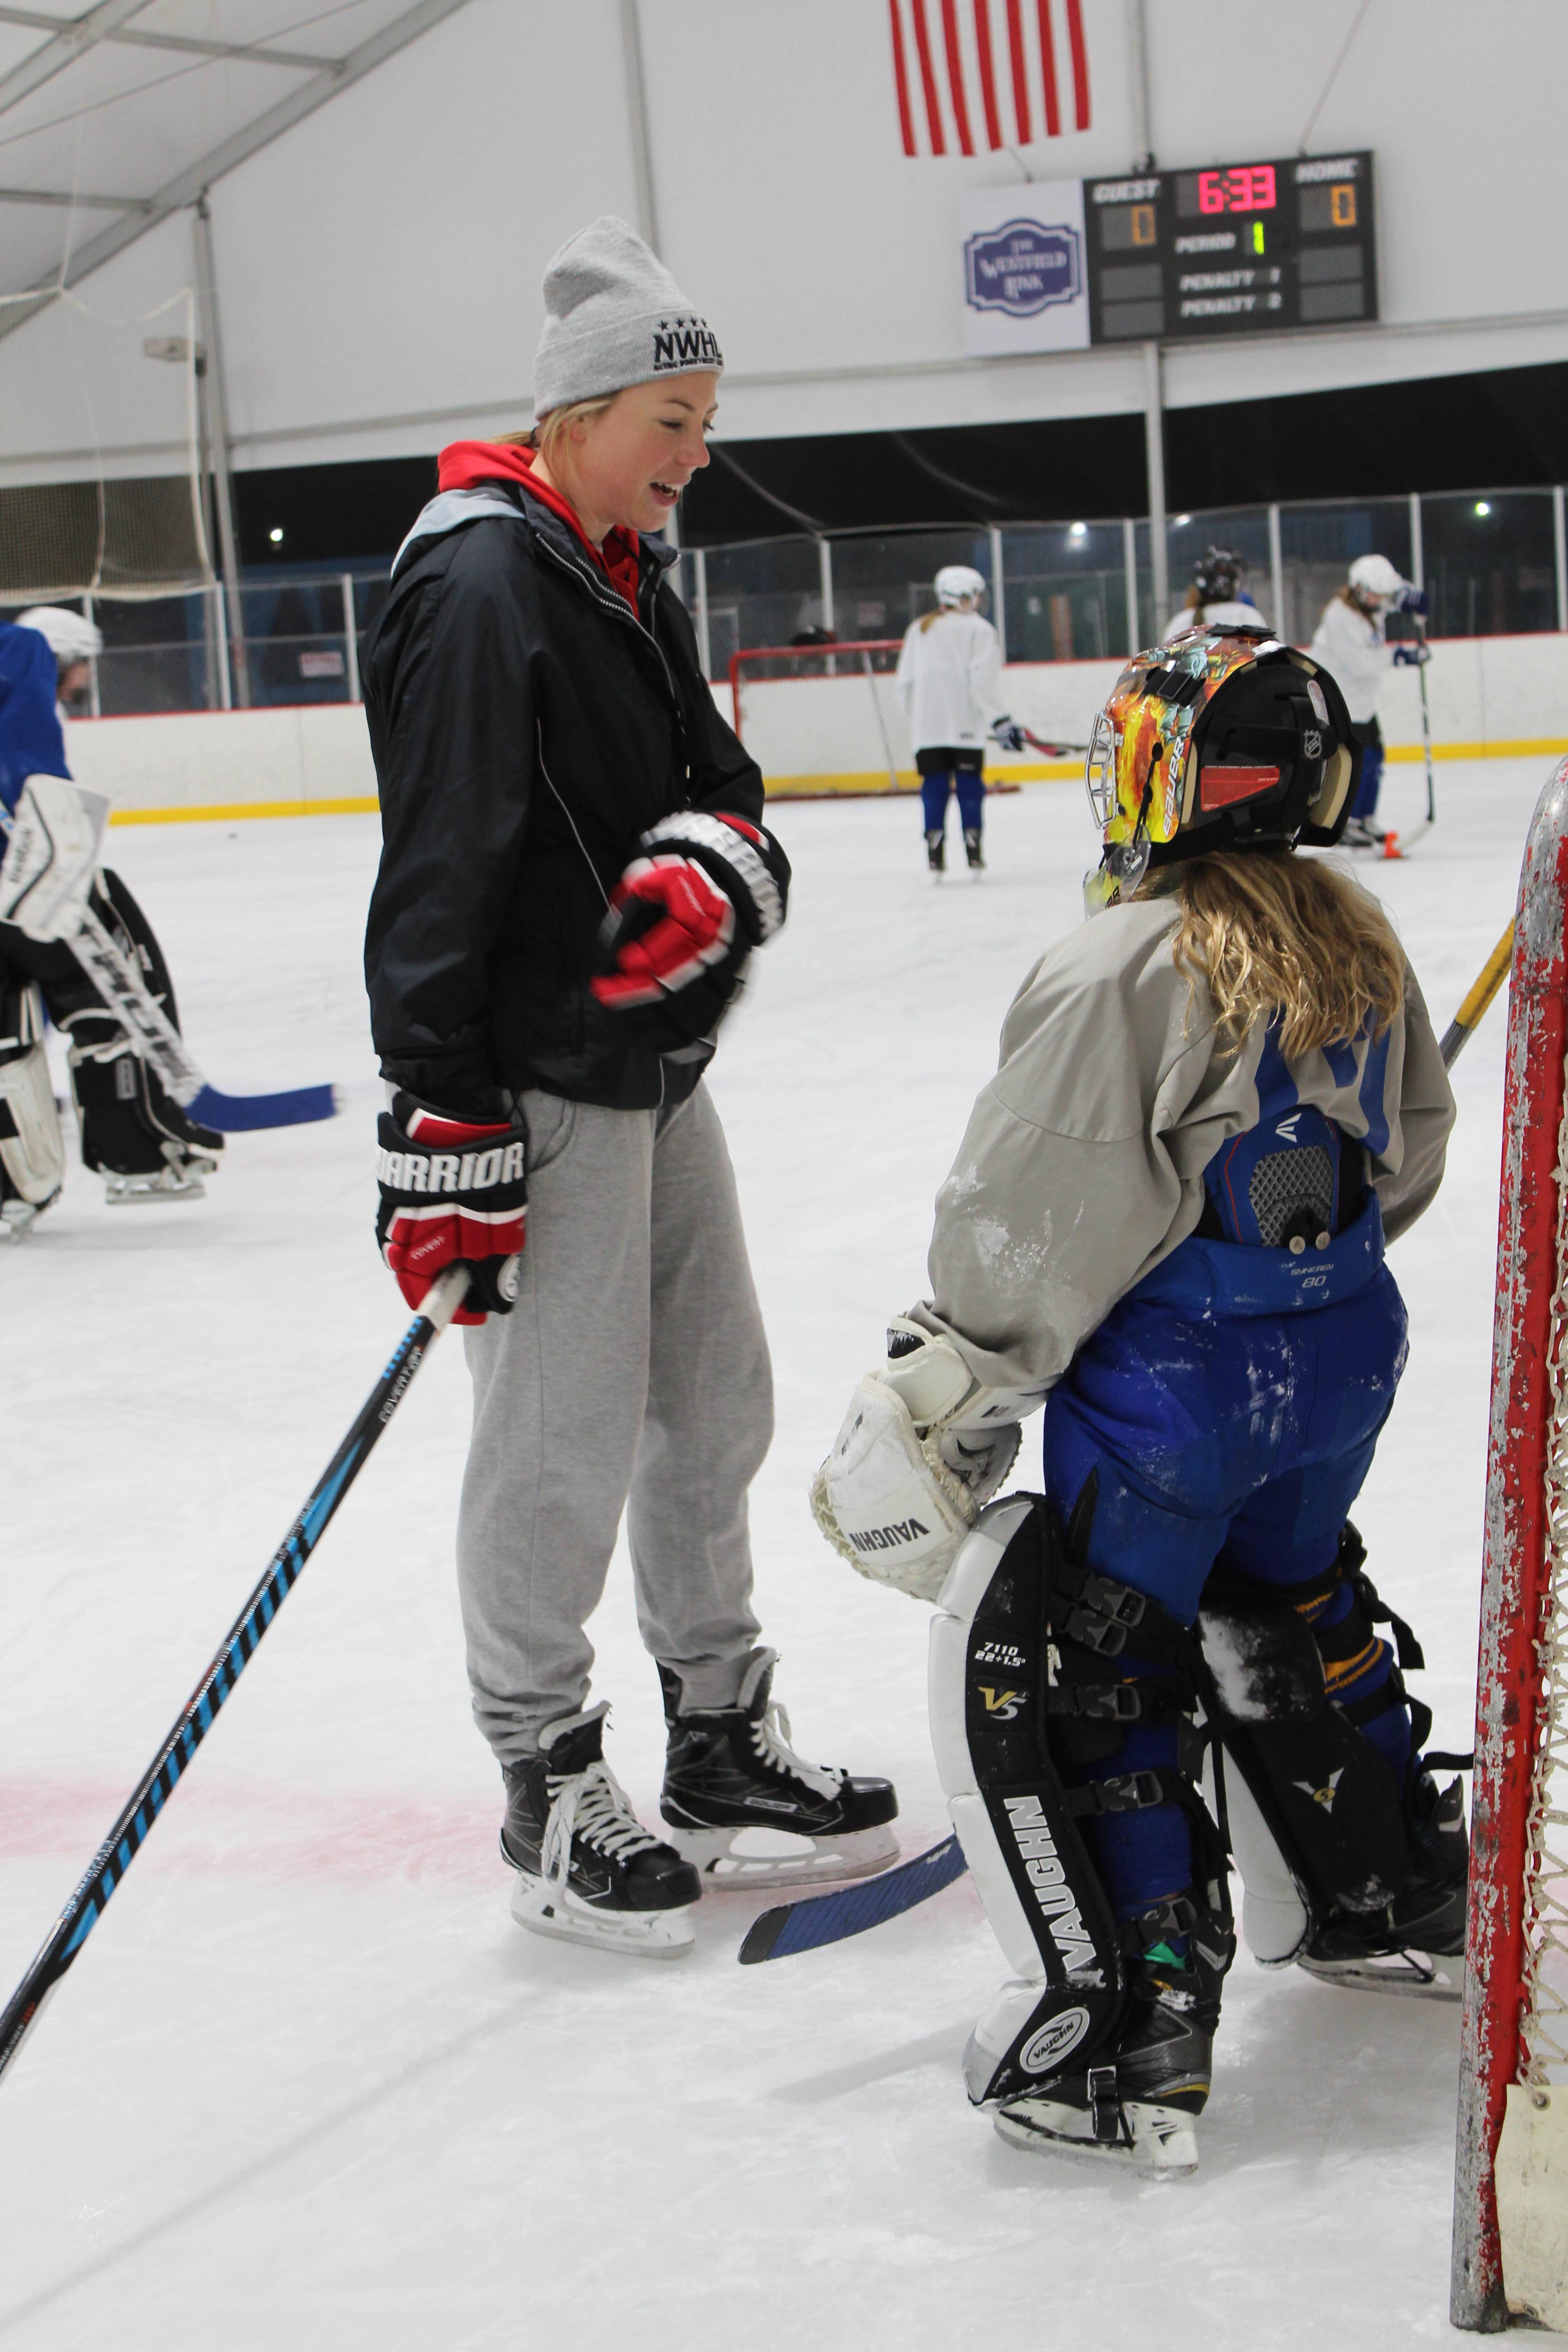 JohnMcDevittHockeyPic2.JPG